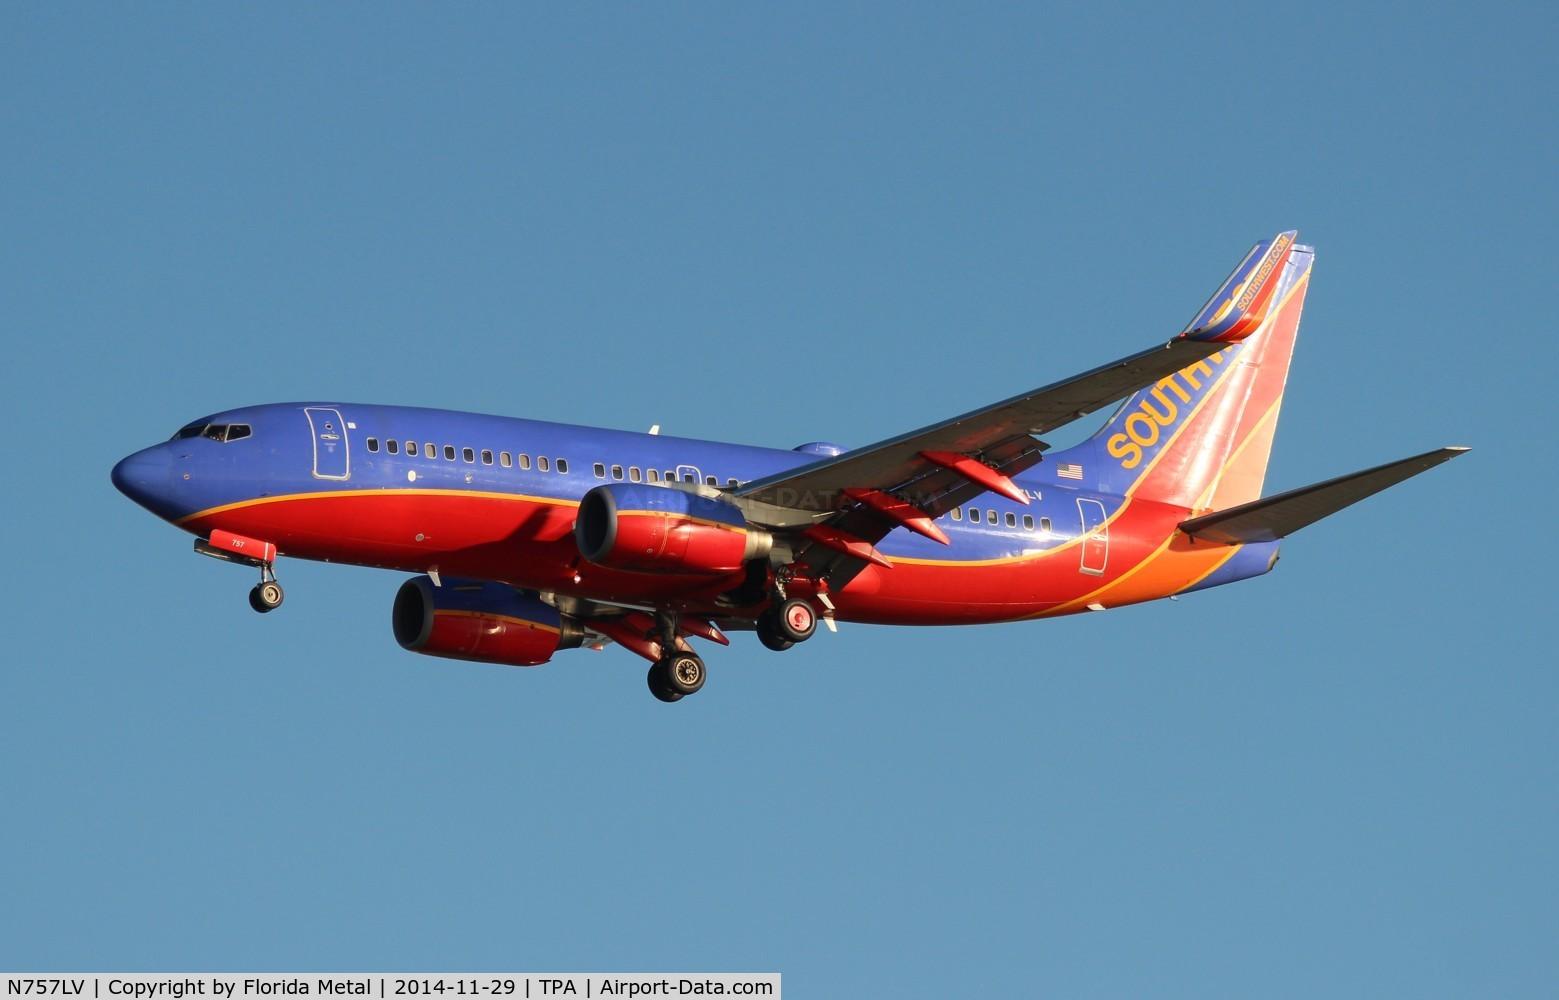 N757LV, 1999 Boeing 737-7H4 C/N 29850, Southwest